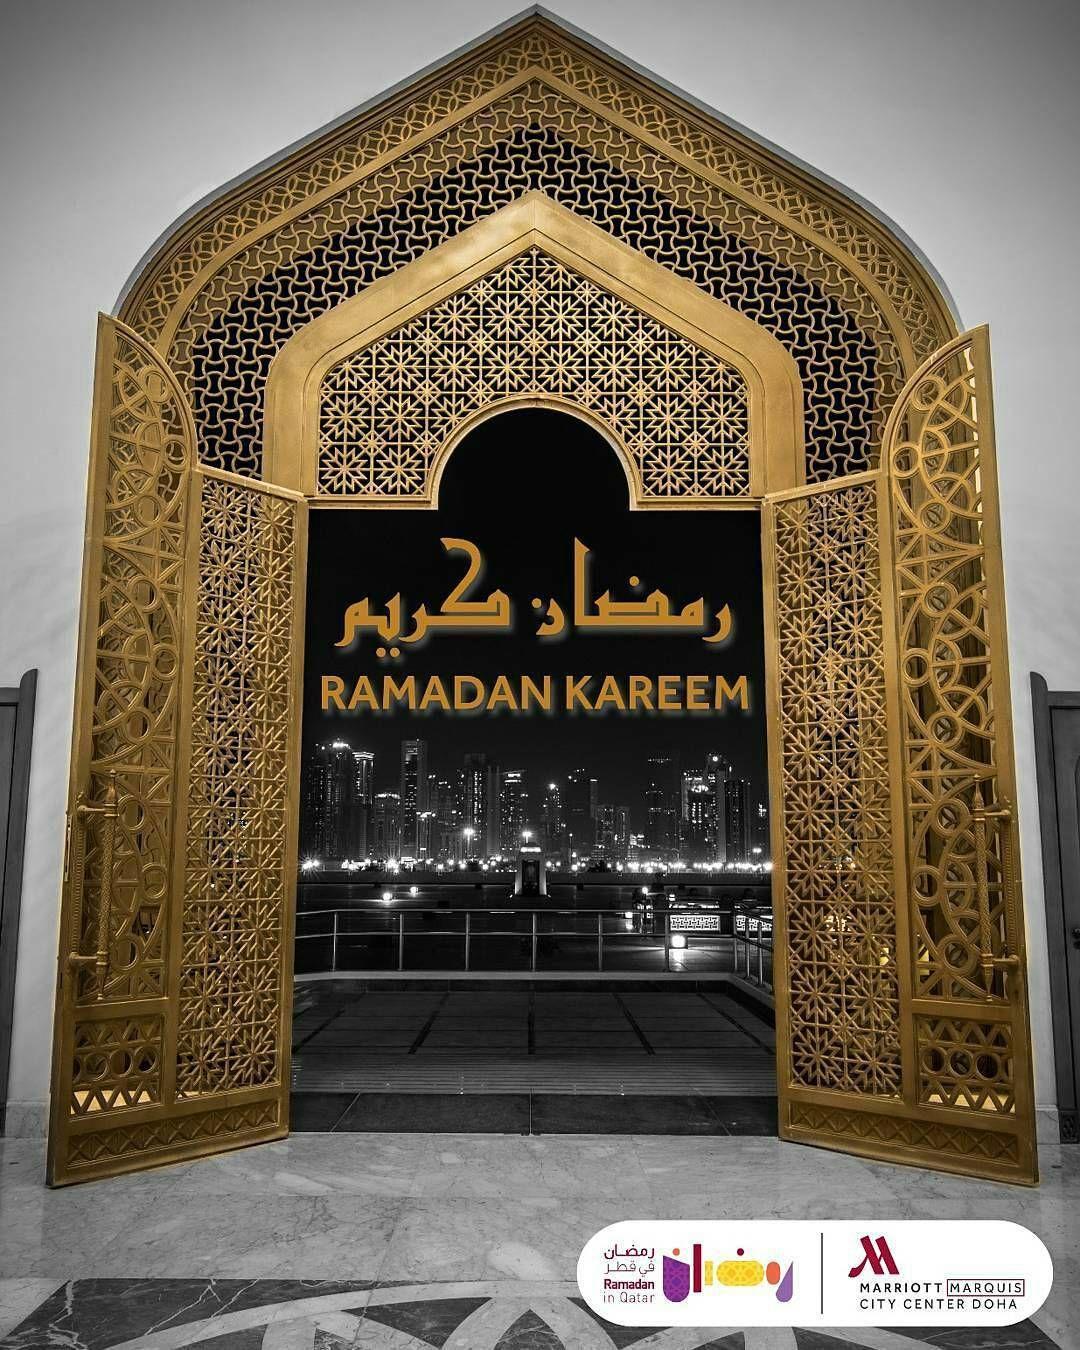 Instagram Photo By Qatarism Com Jun 6 2016 At 5 54pm Utc Instagram Ramadan Kareem Whiskey Bottle